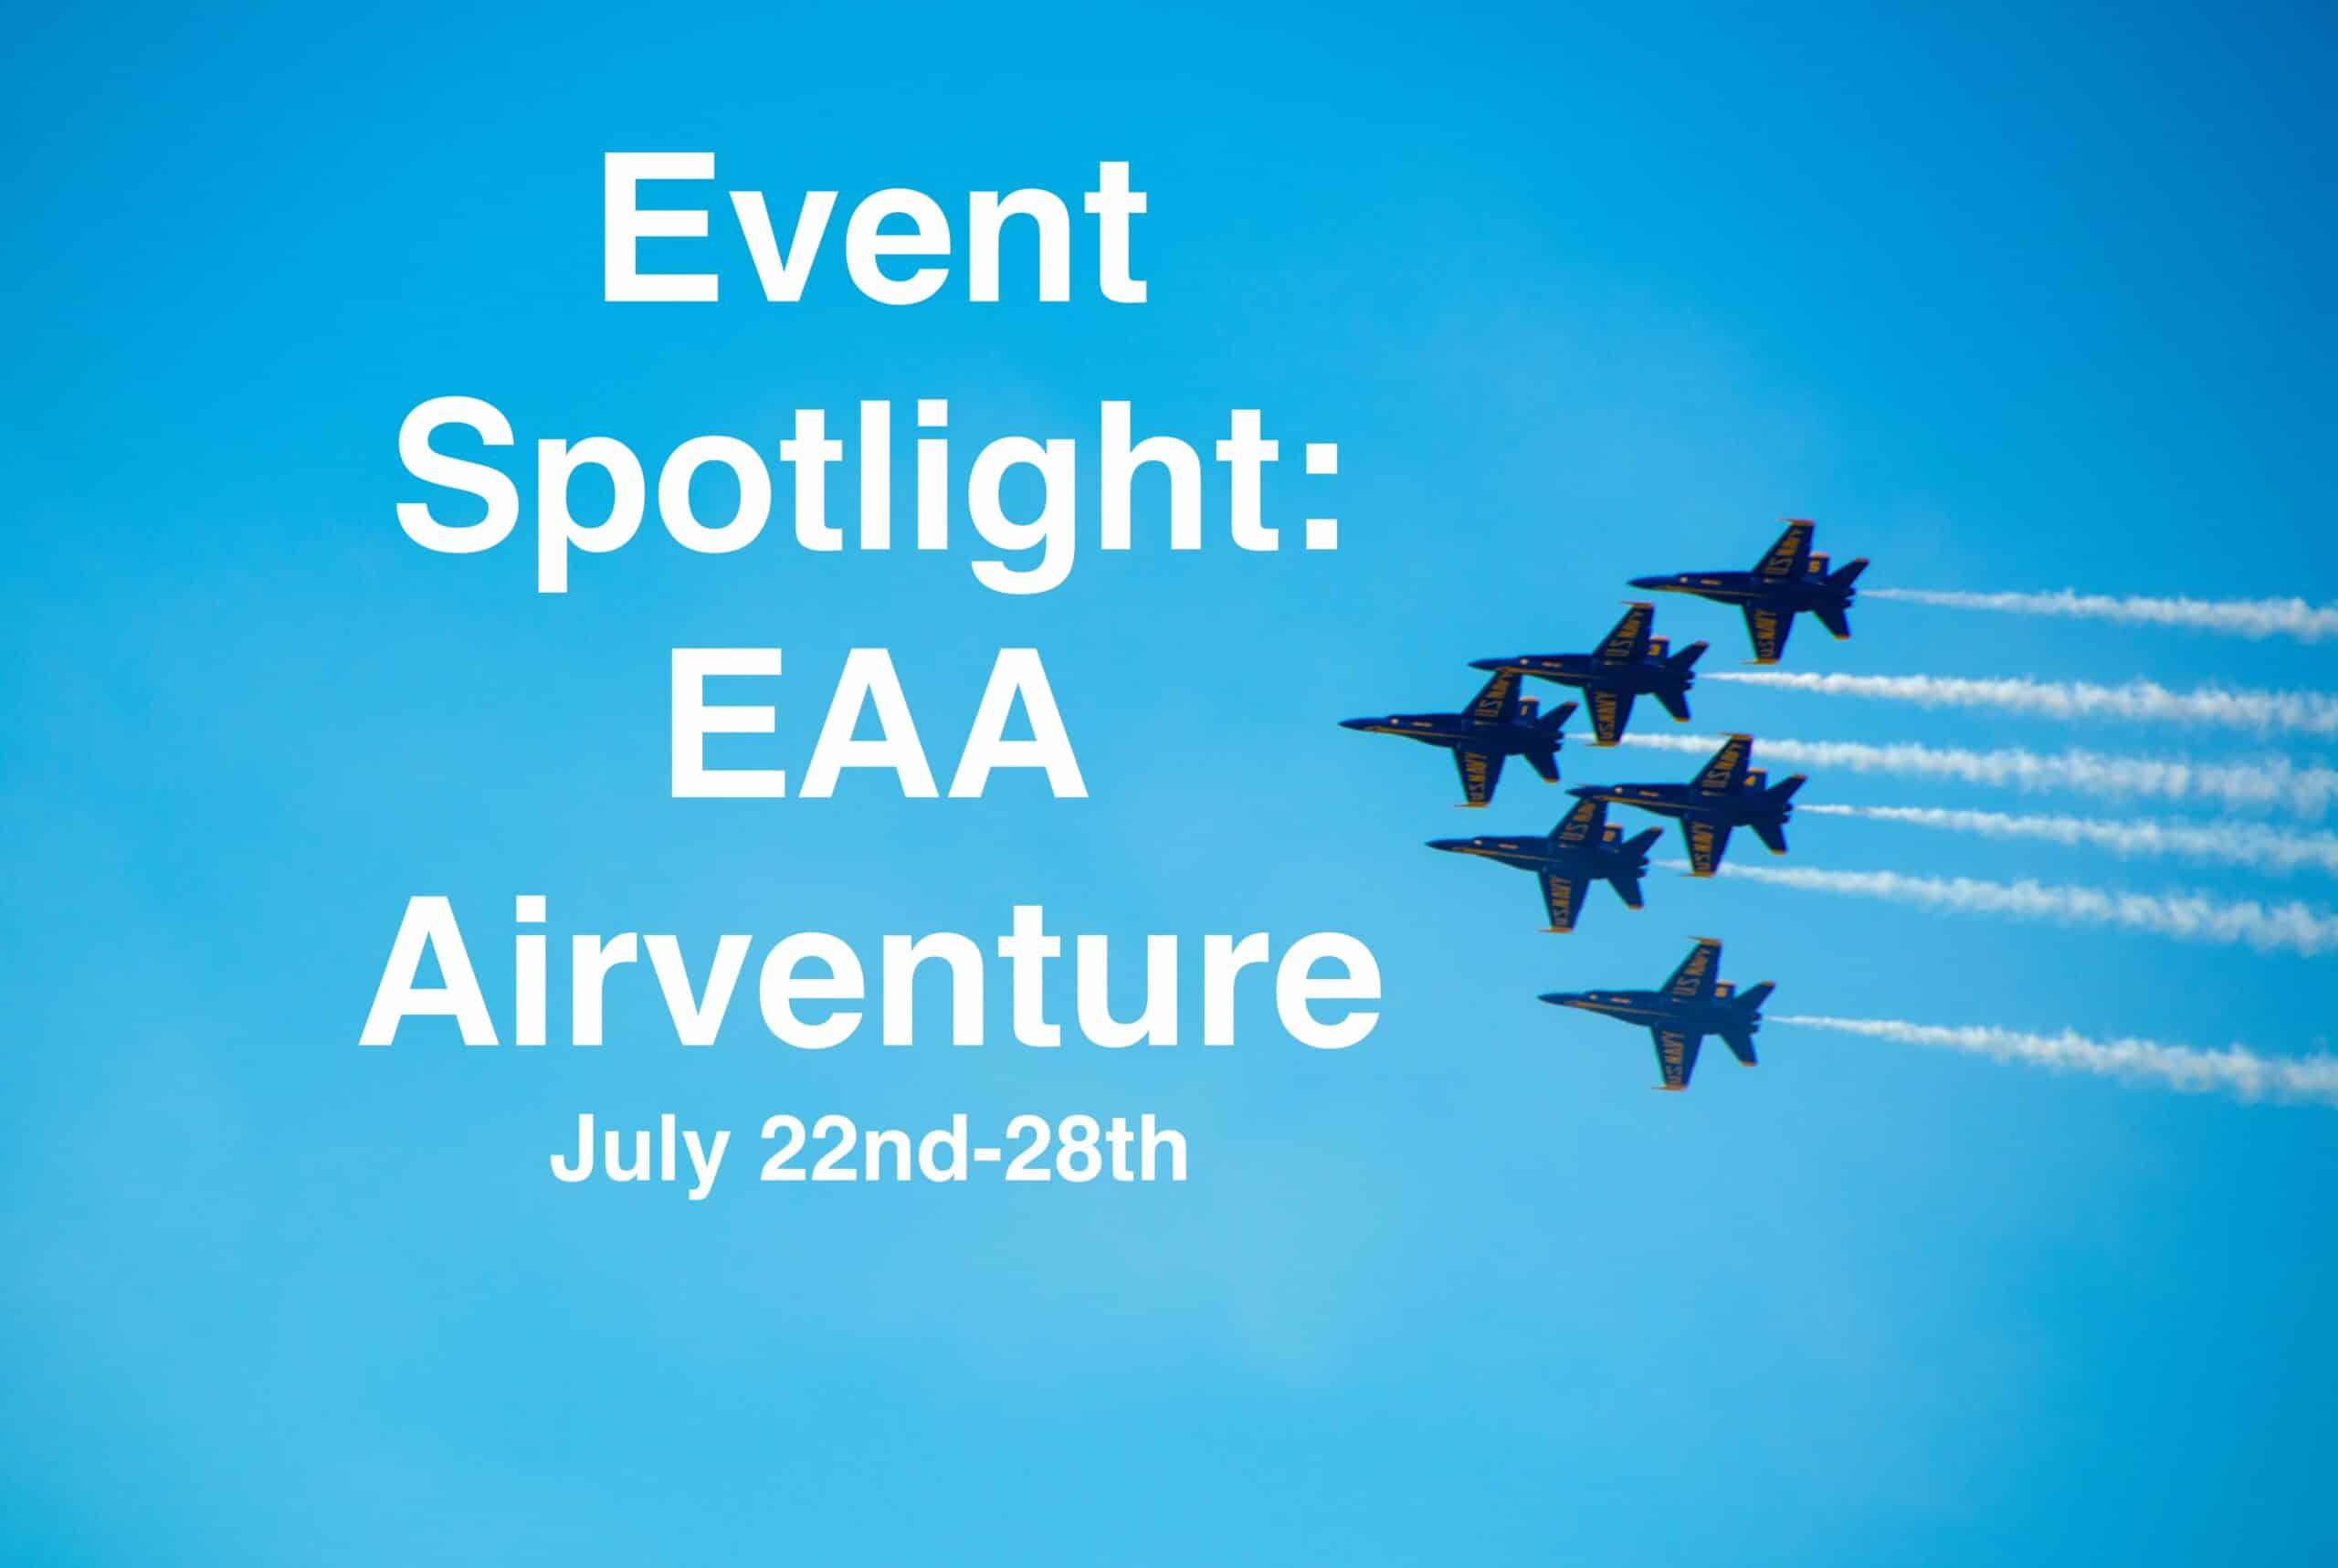 Event Spotlight EEA Airventure